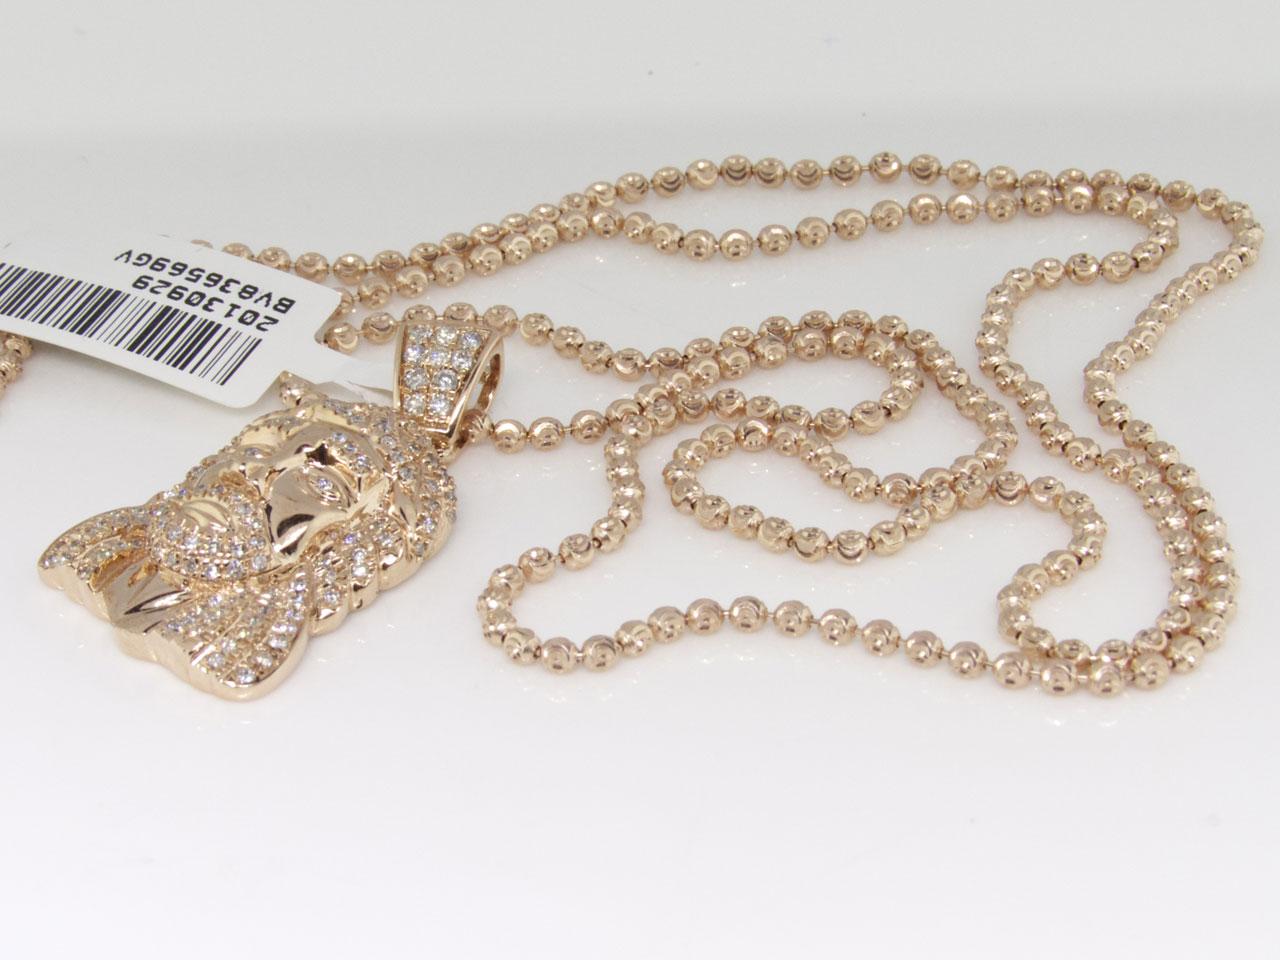 Mini jesus face diamond pendant set in 10k rose gold with chain 10 mini jesus face diamond pendant set in 10k rose gold with chain 10 ct walmart aloadofball Image collections